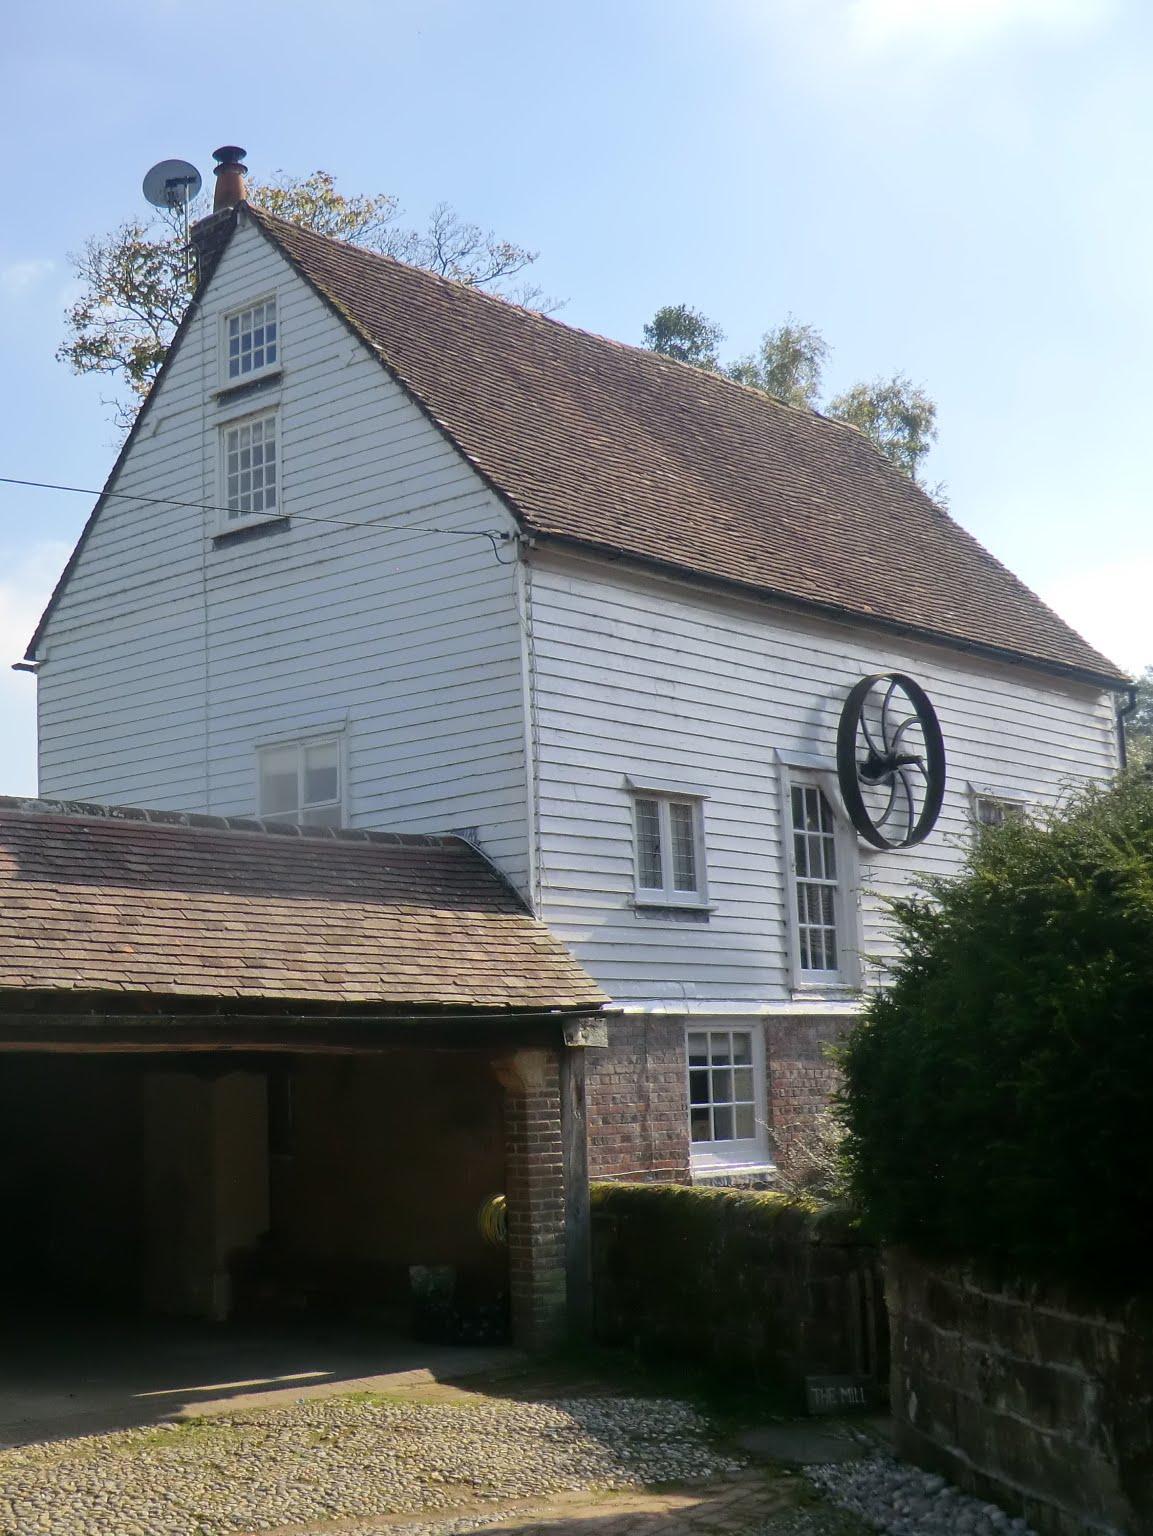 CIMG0811 Newbridge Mill